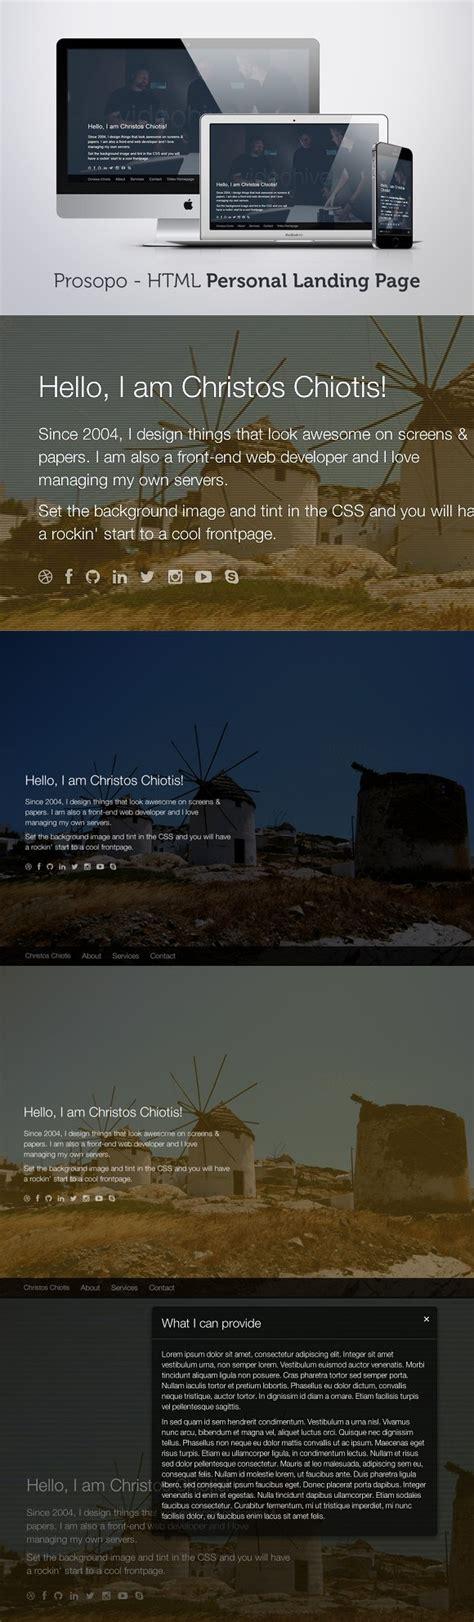 prosopo personal html landing page landing page